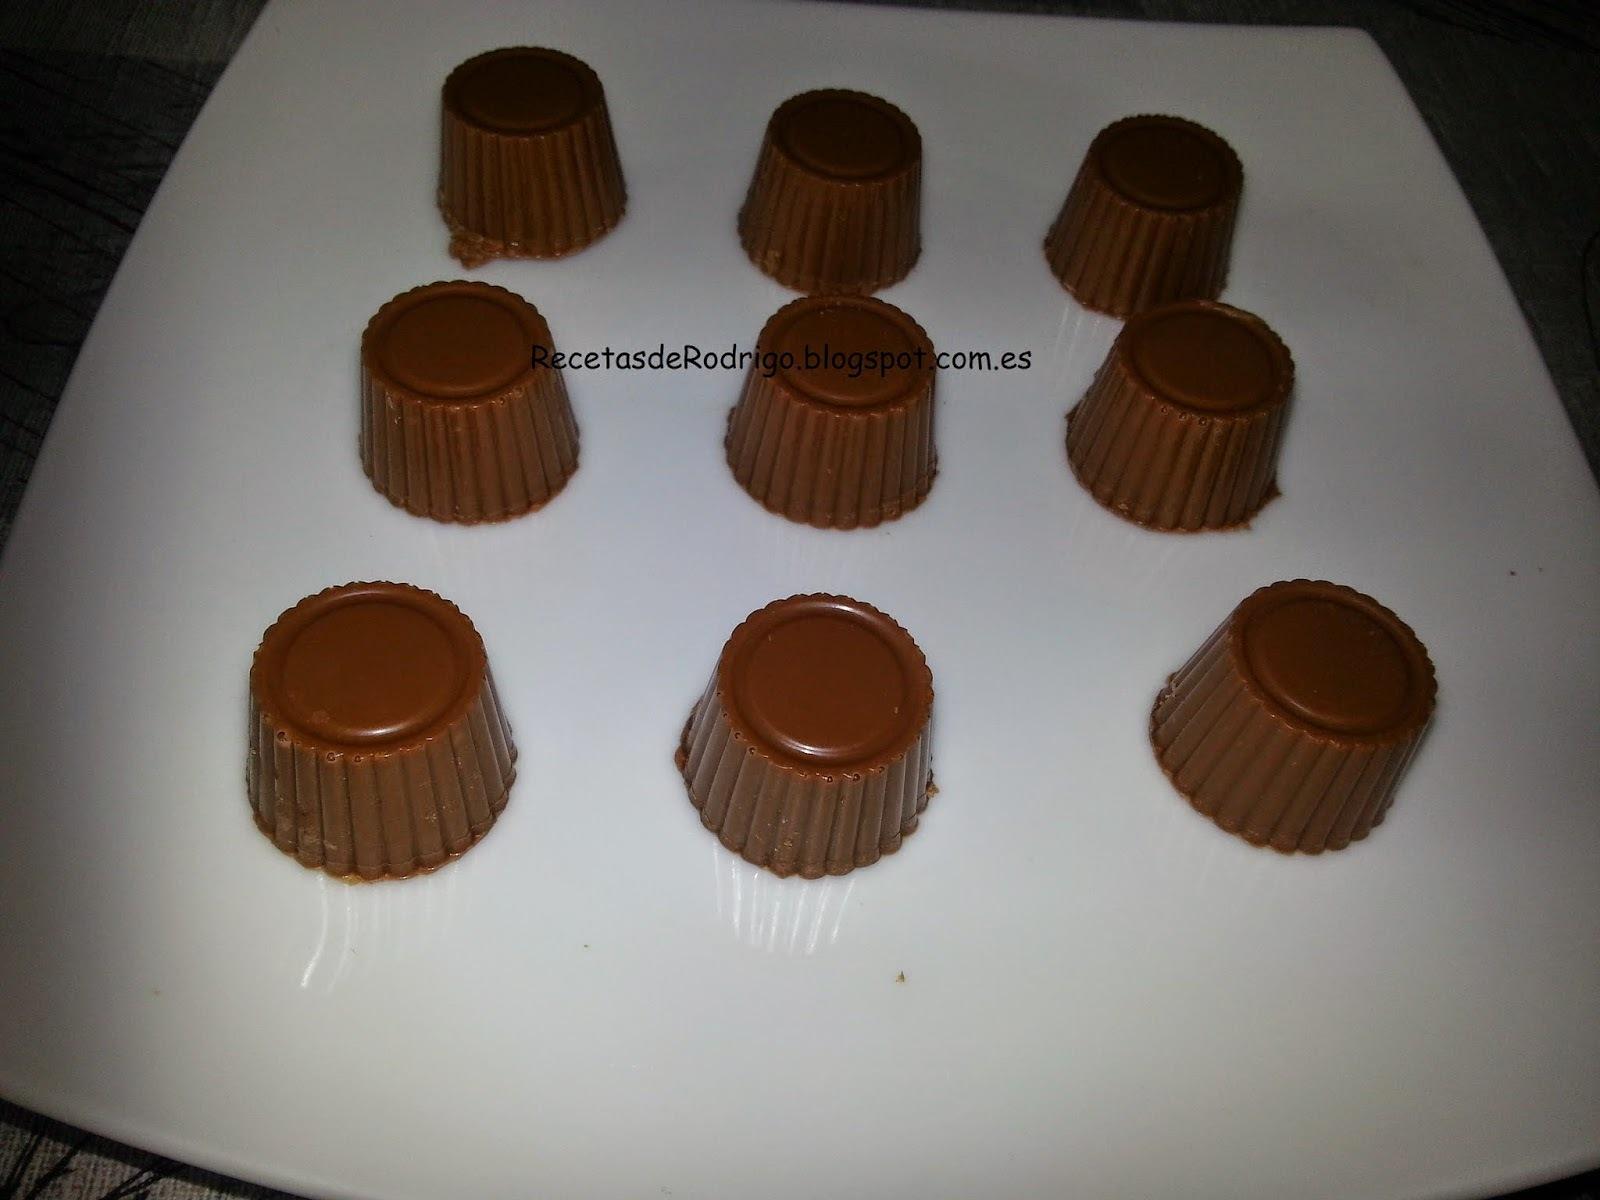 Repostería - Bombones - Bombones de chocolate con leche con pasta de avellanas y dulce de leche